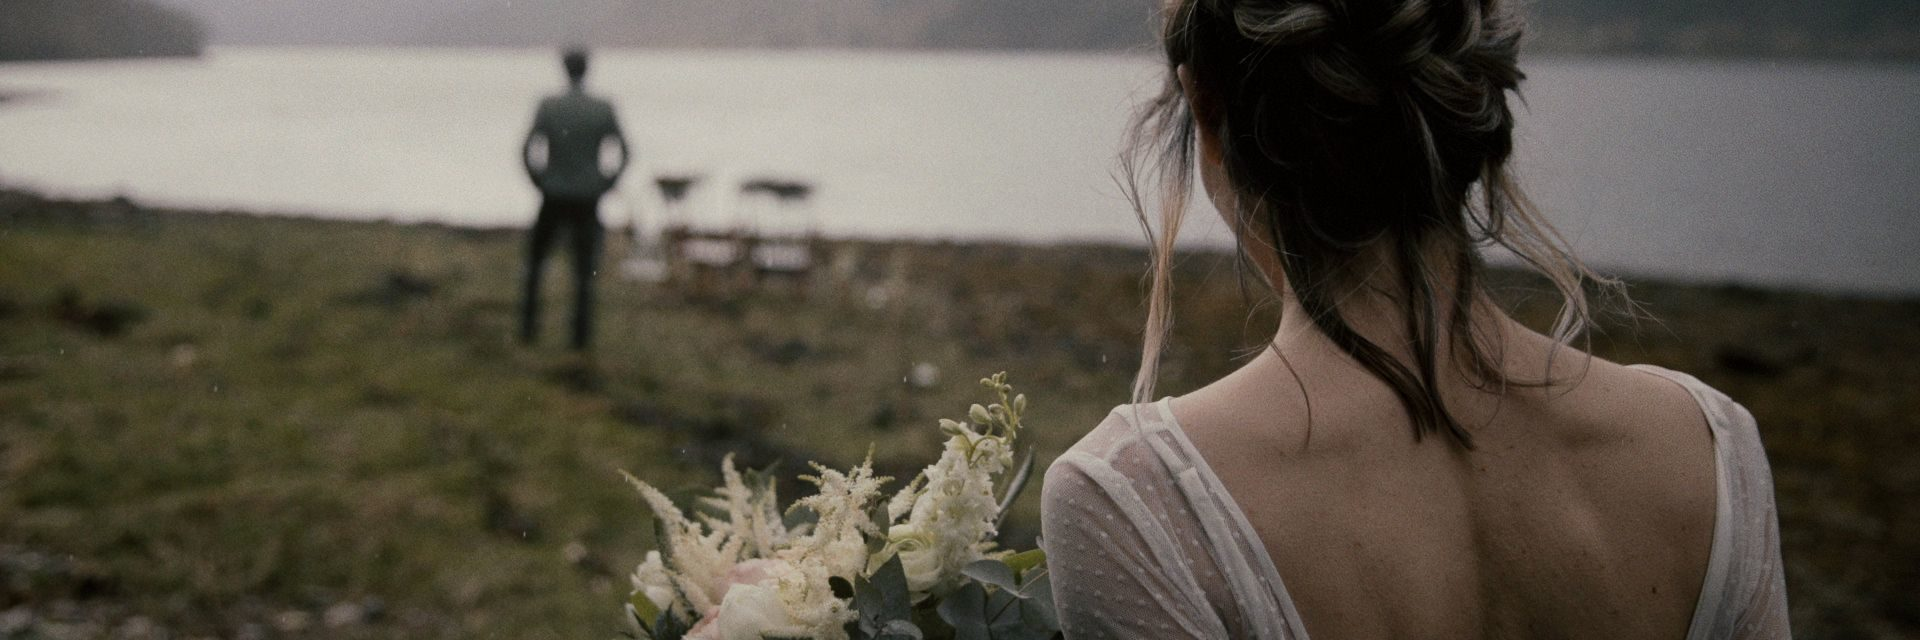 Barcelona-wedding-videographer-cinemate-films-02